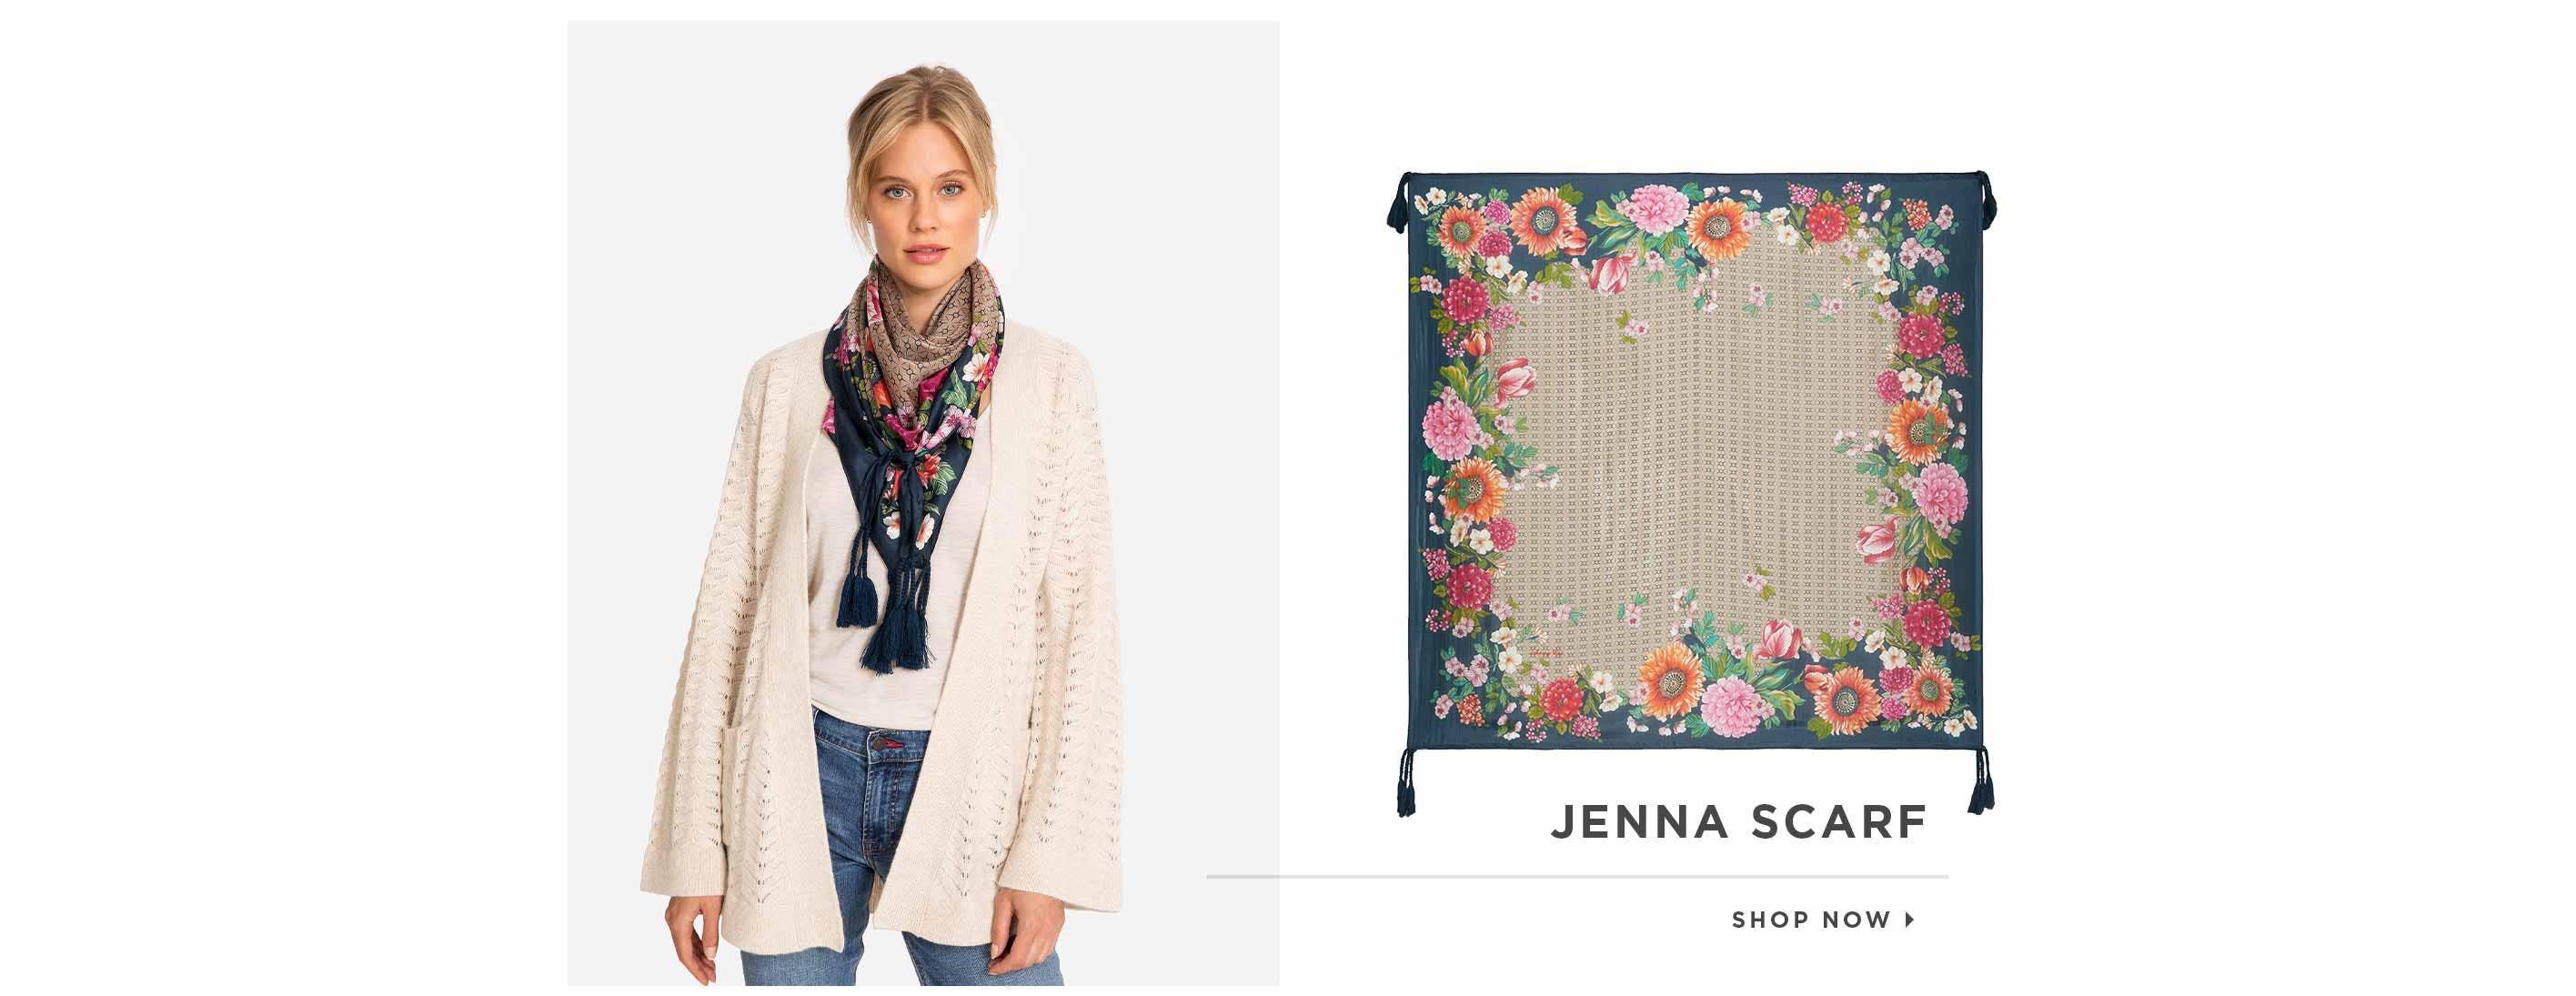 Jenna Scarf. Shop now.